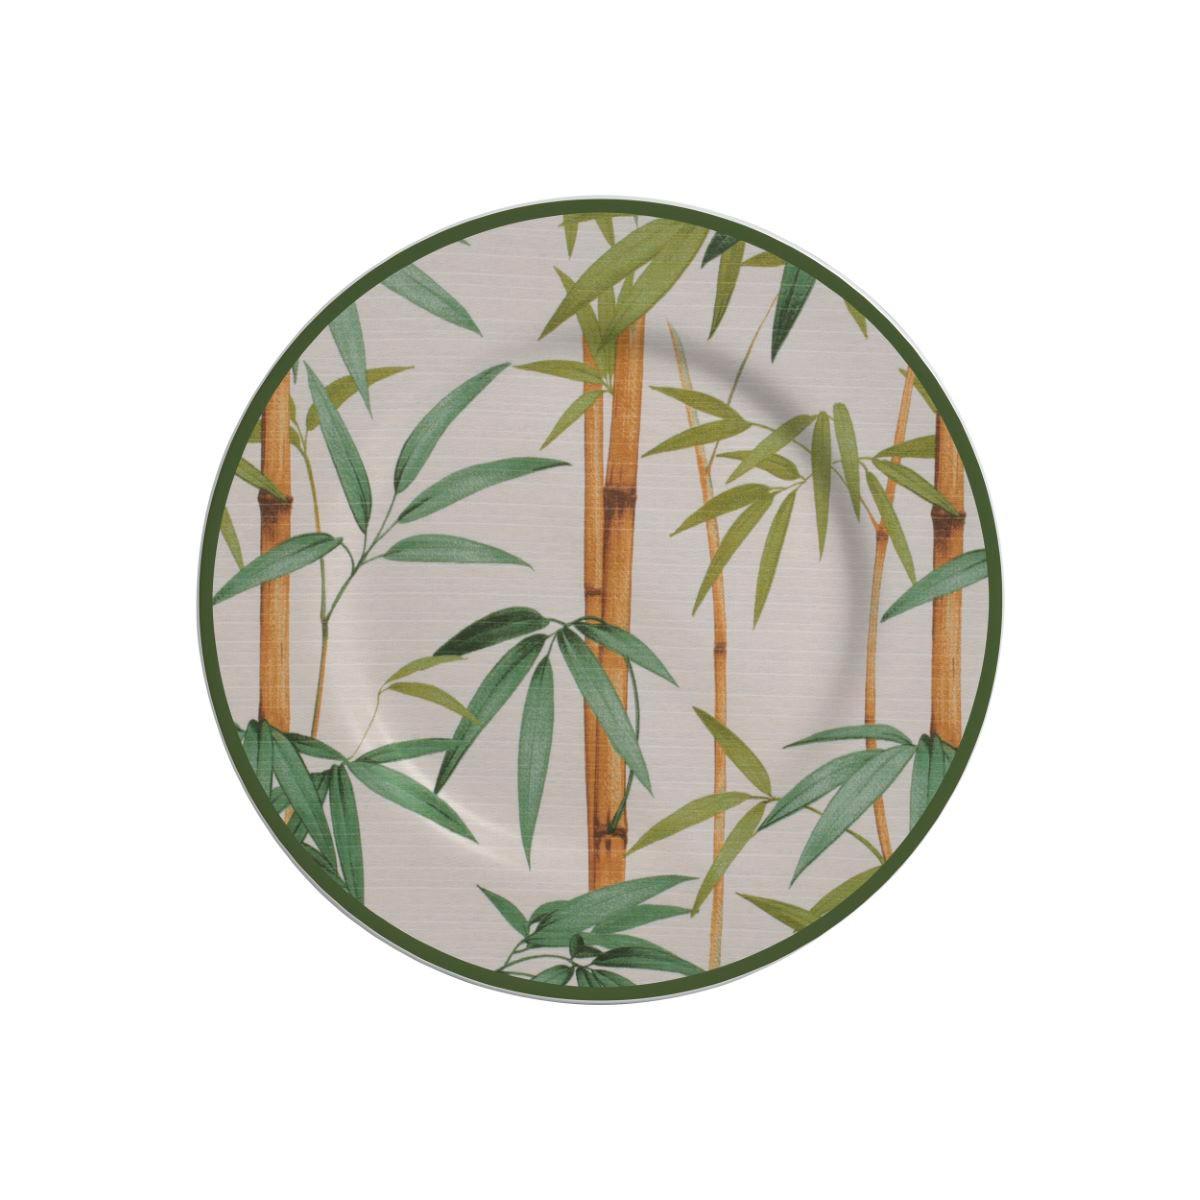 Prato Sobremesa Bambu Cerâmica Alleanza - 6 Peças